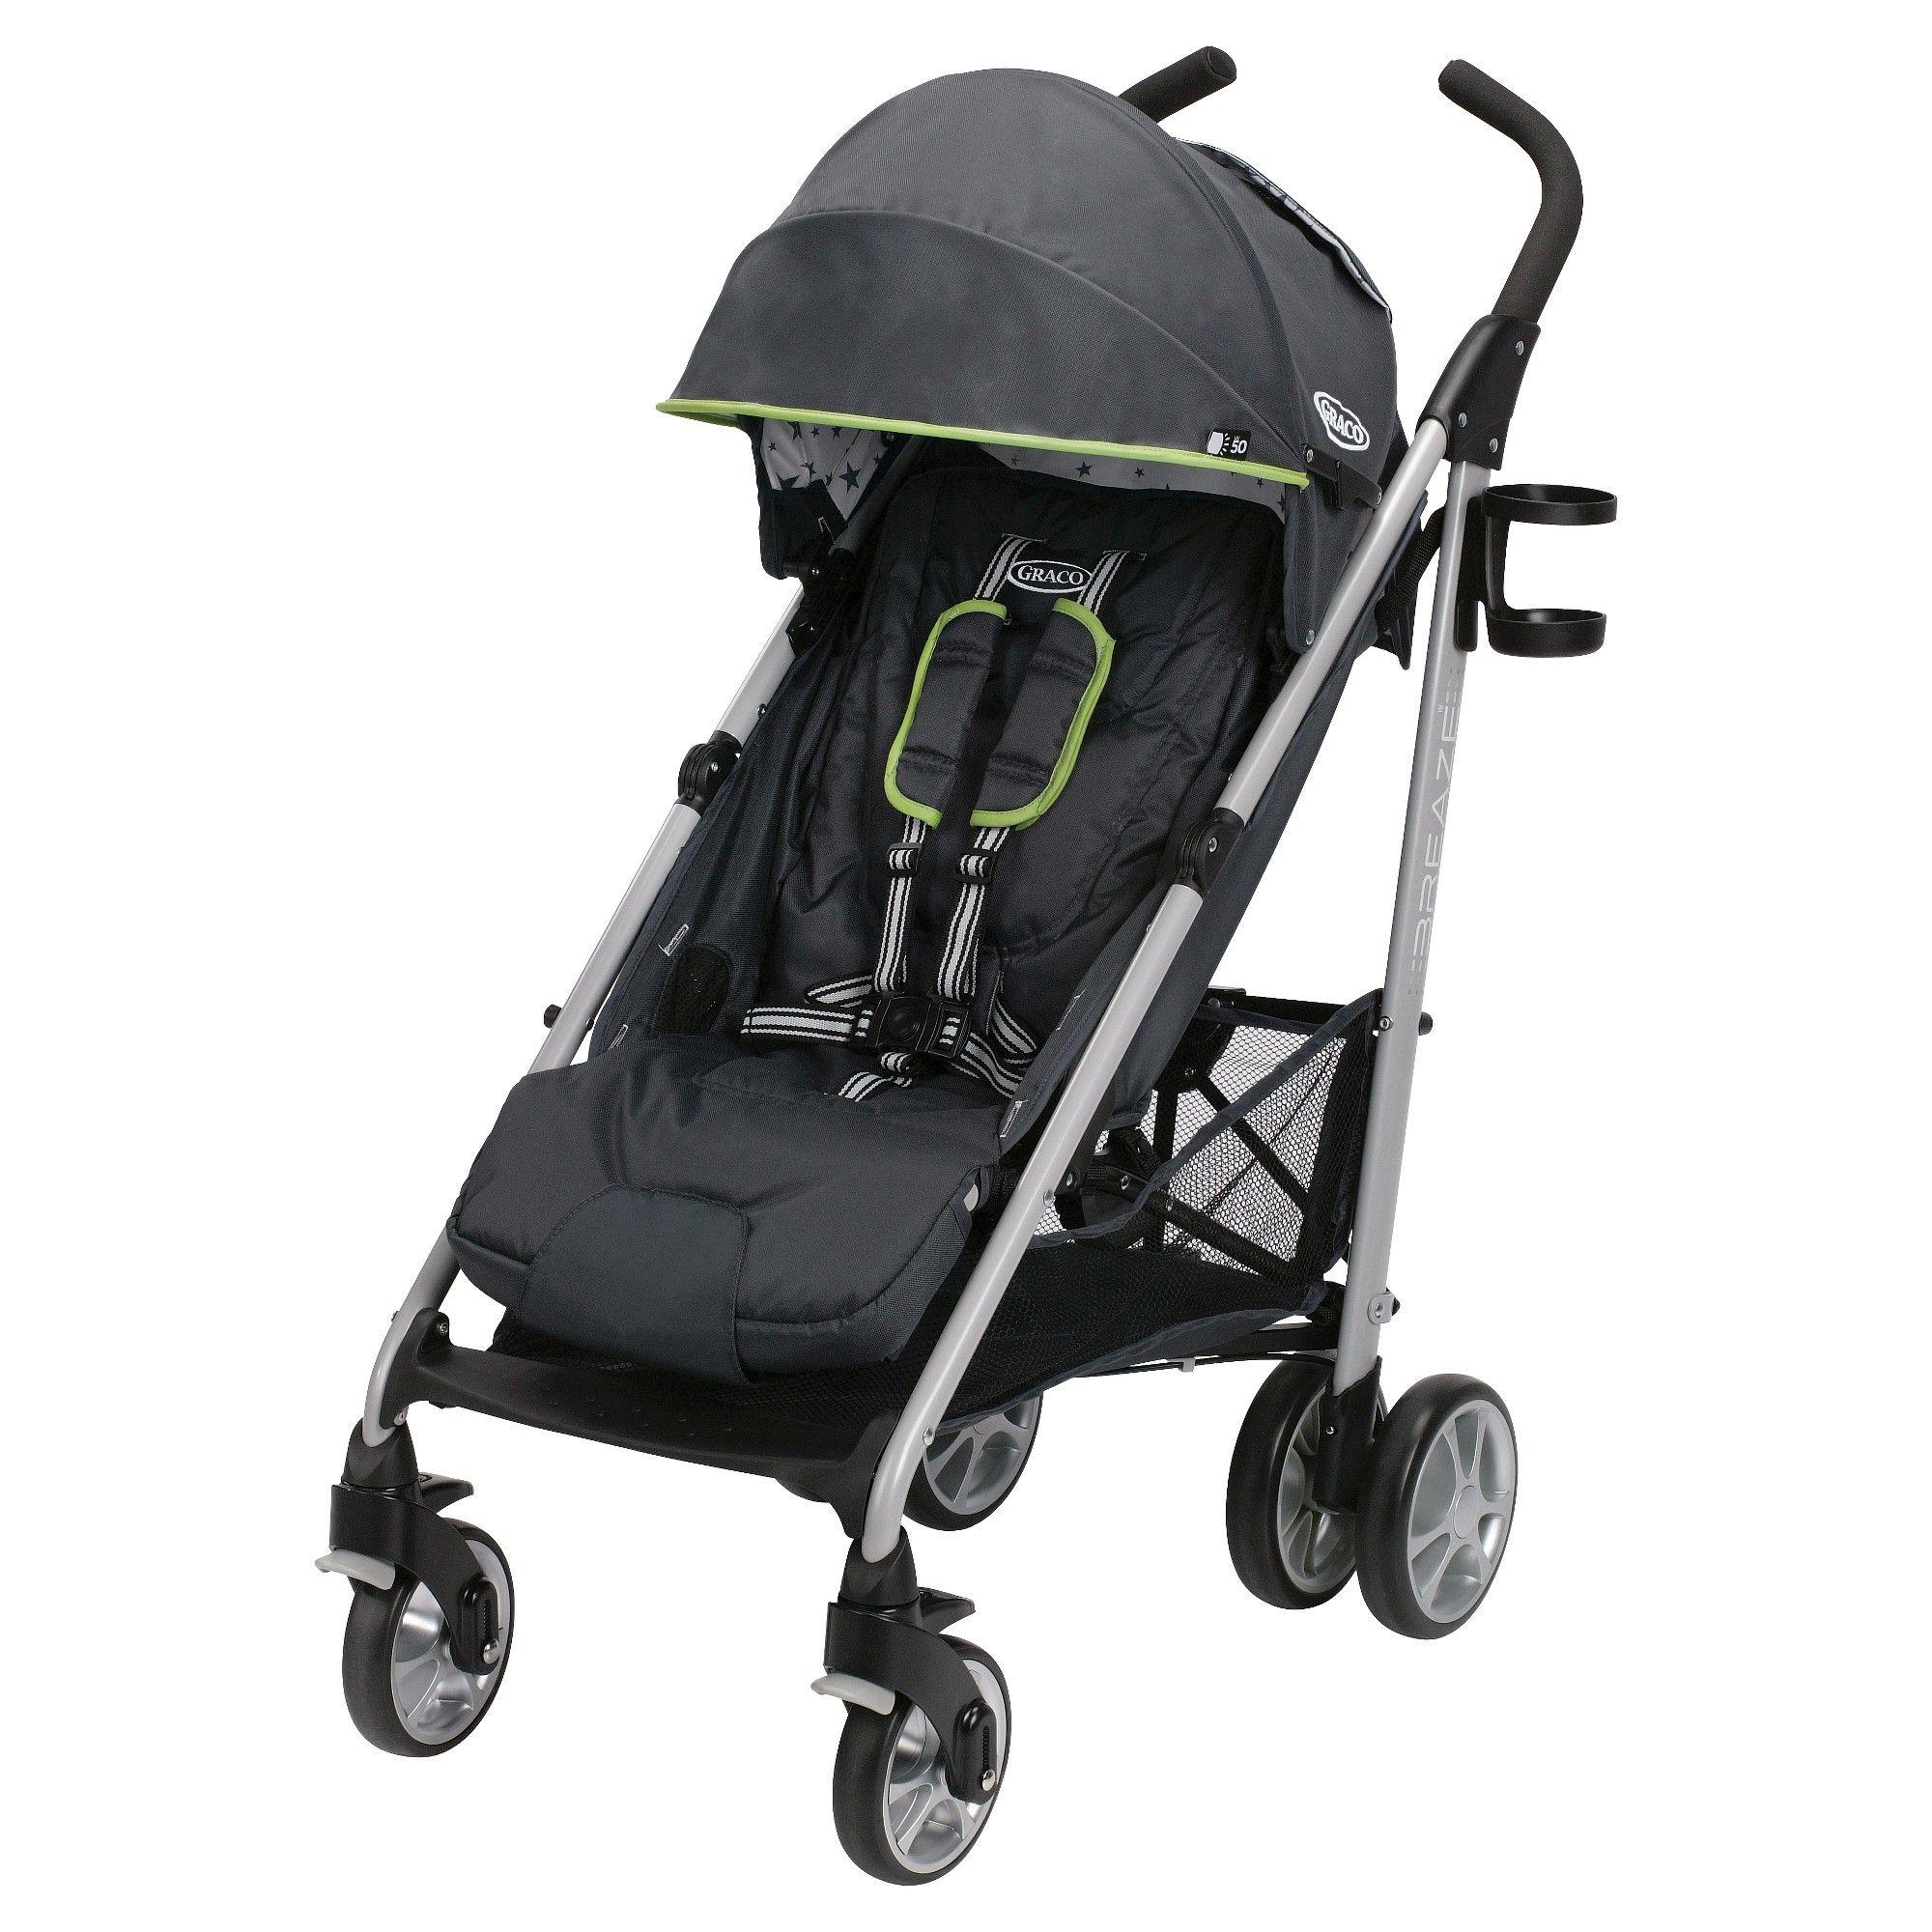 Graco Breaze Click Connect Umbrella Stroller - Shine | Products